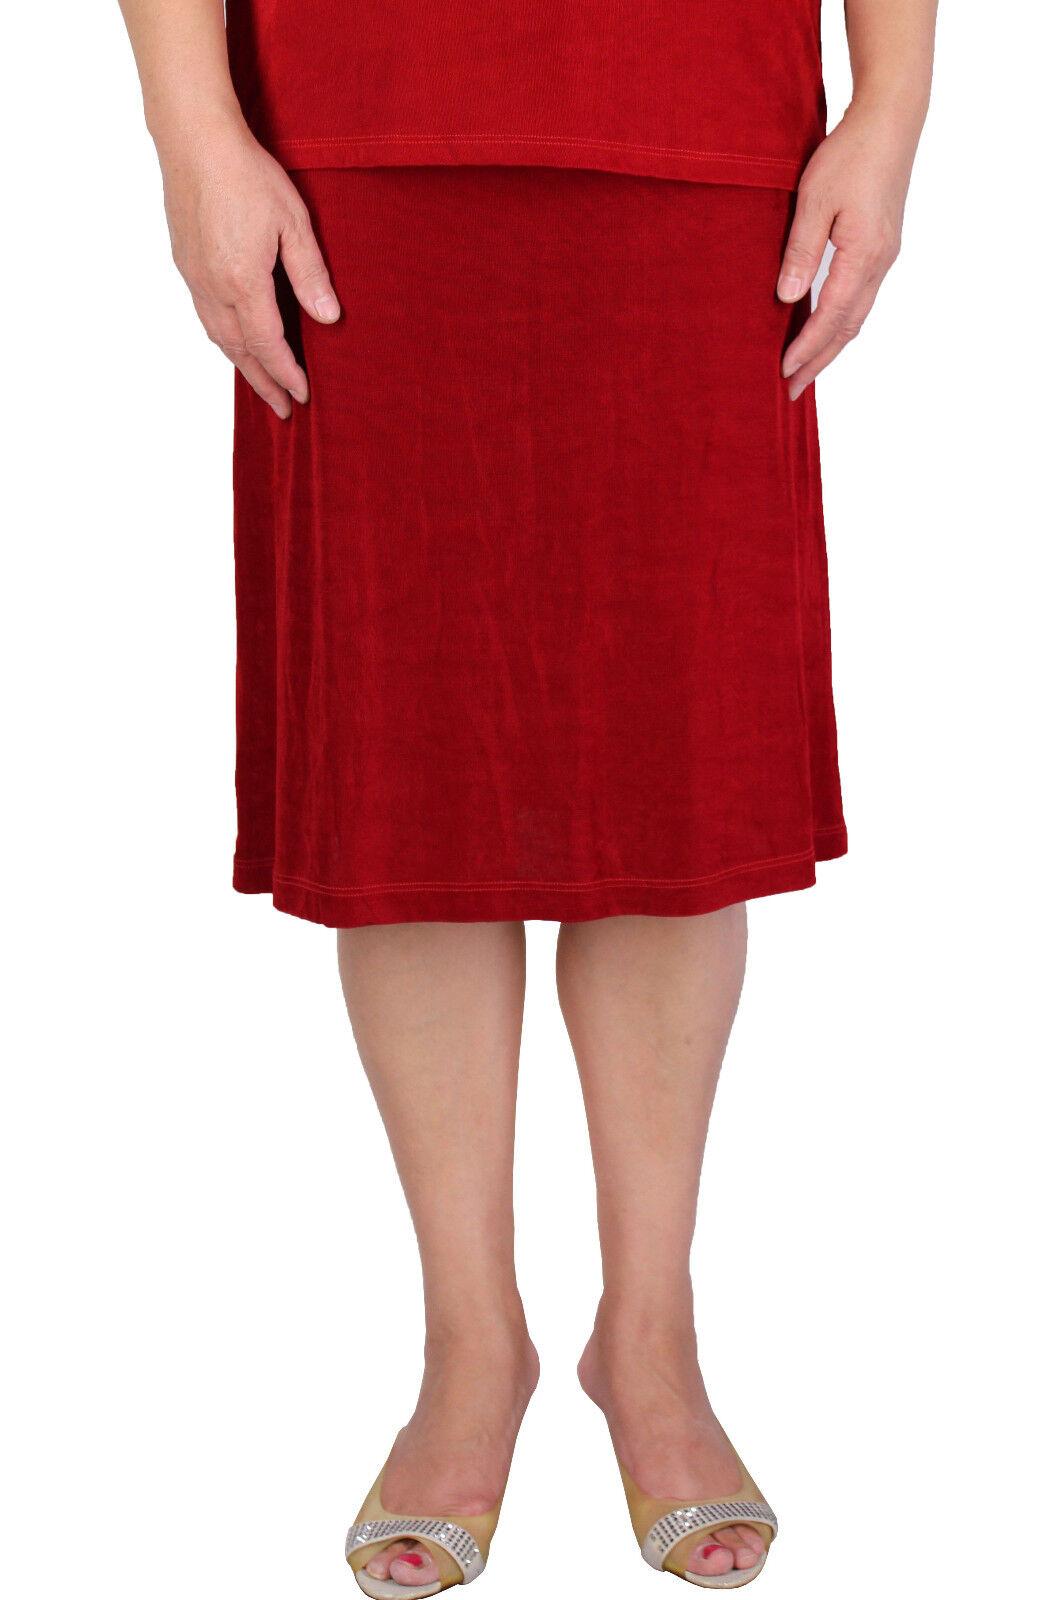 Women's Red Elastic Waist Short Skirt Slinky Travel Knit Made In USA S-2X Plus